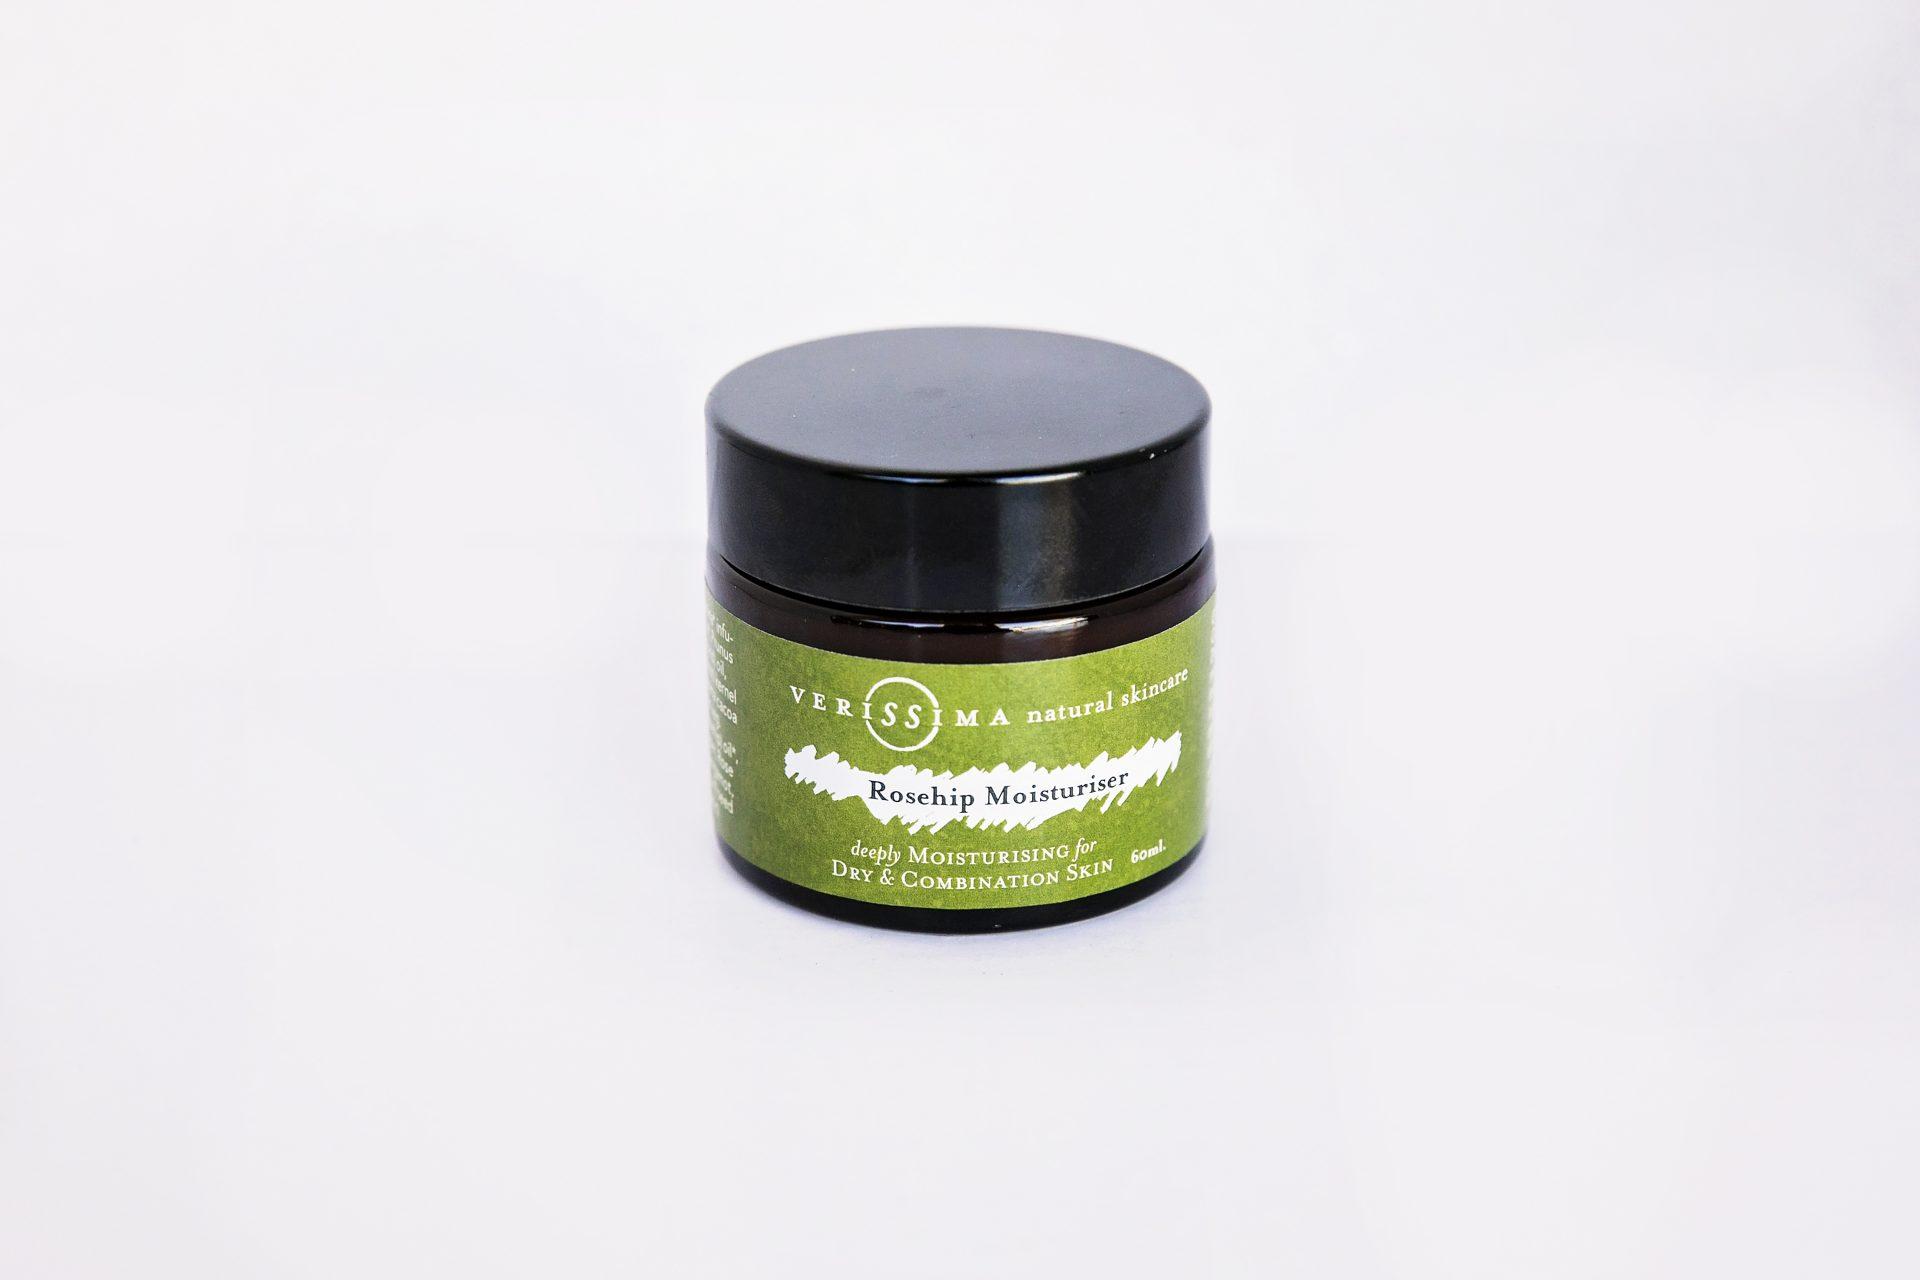 Rosehip Moisturiser | Verissima Natural Skincare | Australia